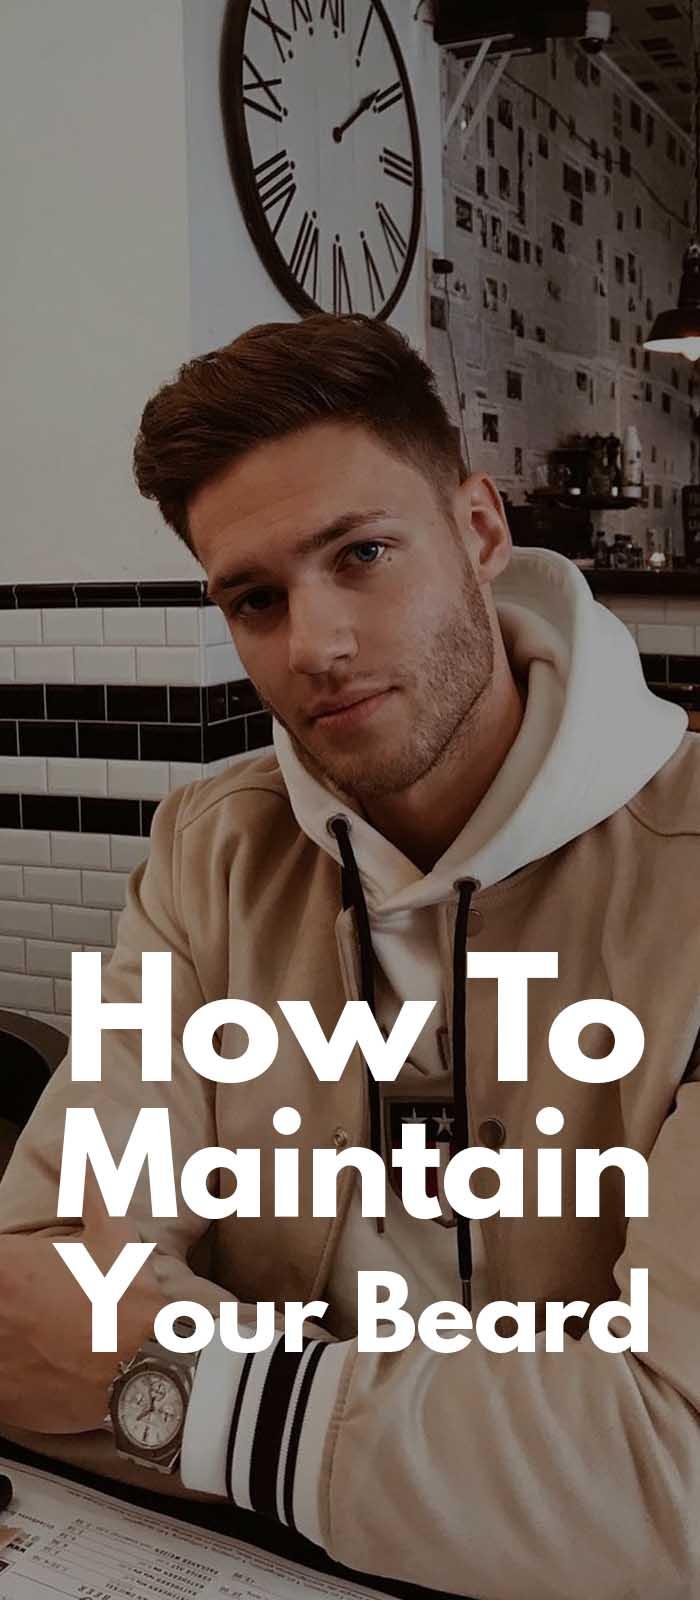 Ways To Maintain Your Beard!